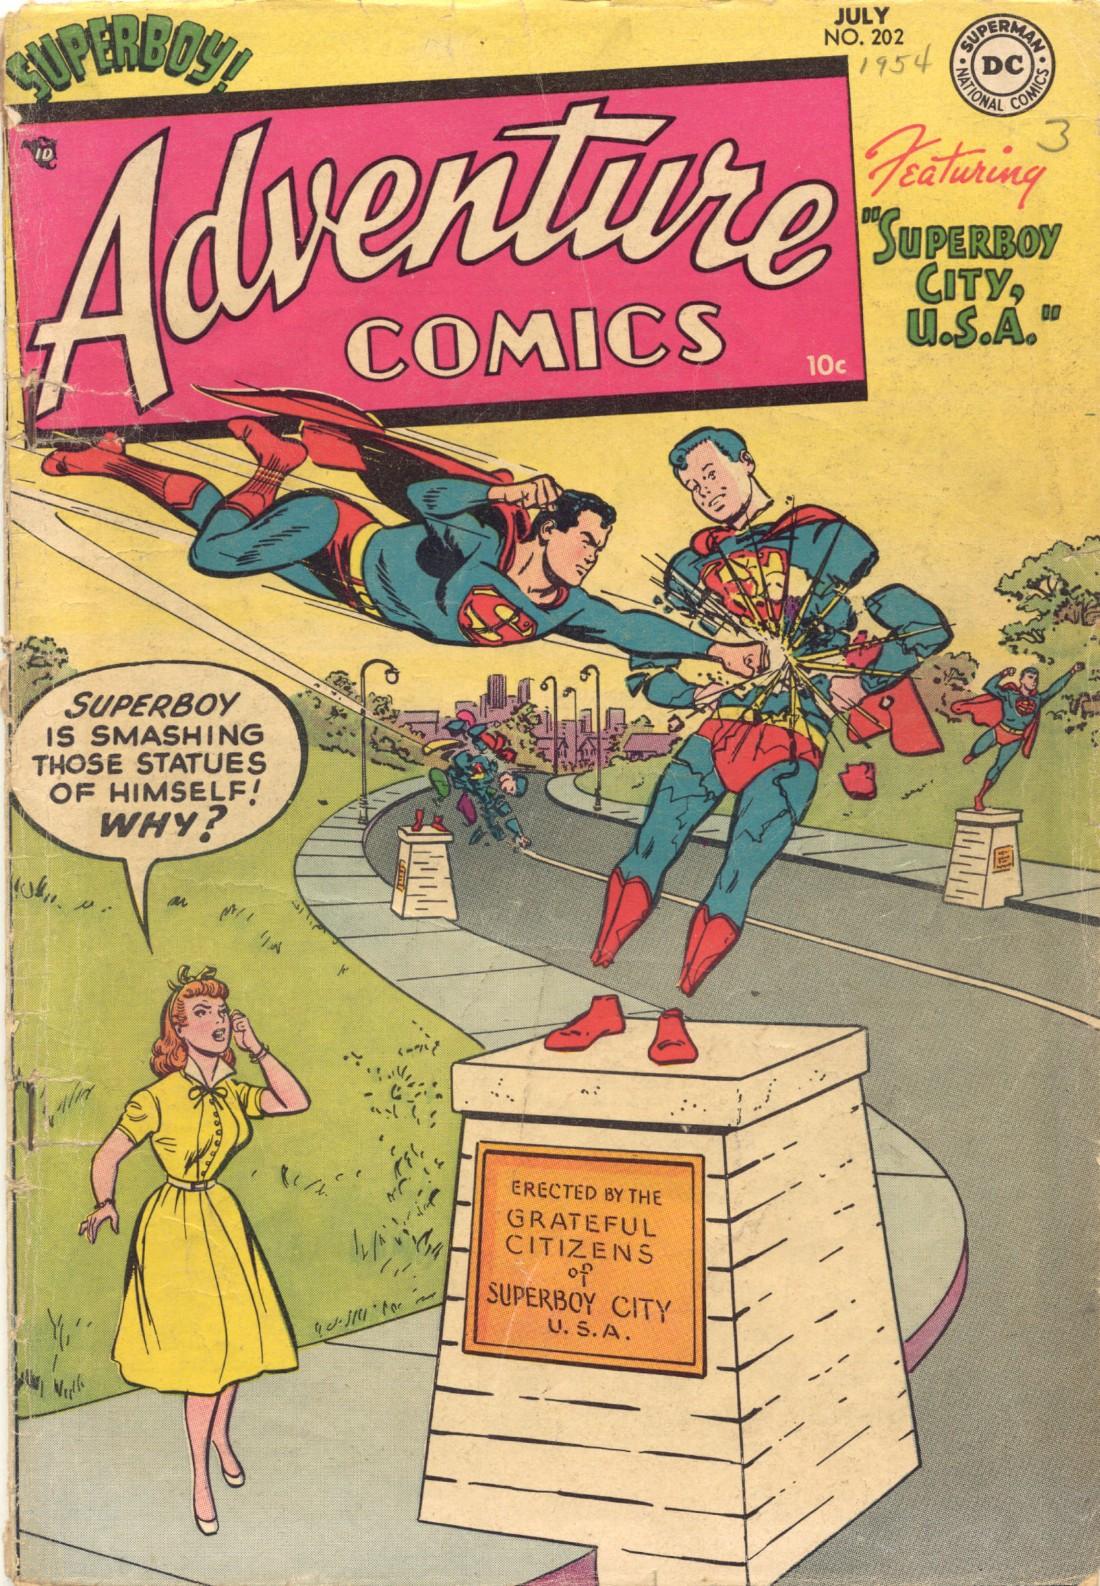 Read online Adventure Comics (1938) comic -  Issue #202 - 1